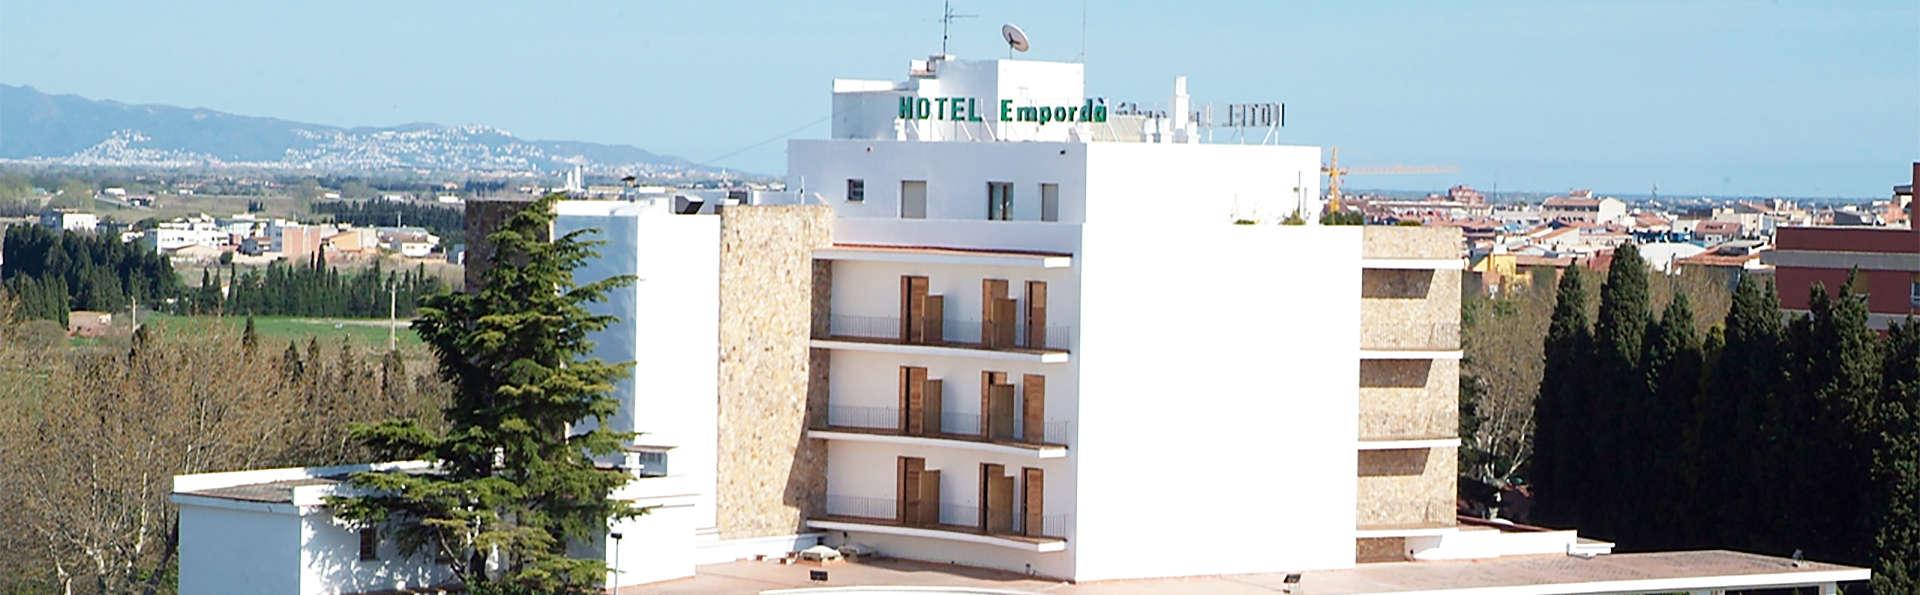 Hotel Gourmet Empordá - EDIT_facade.jpg